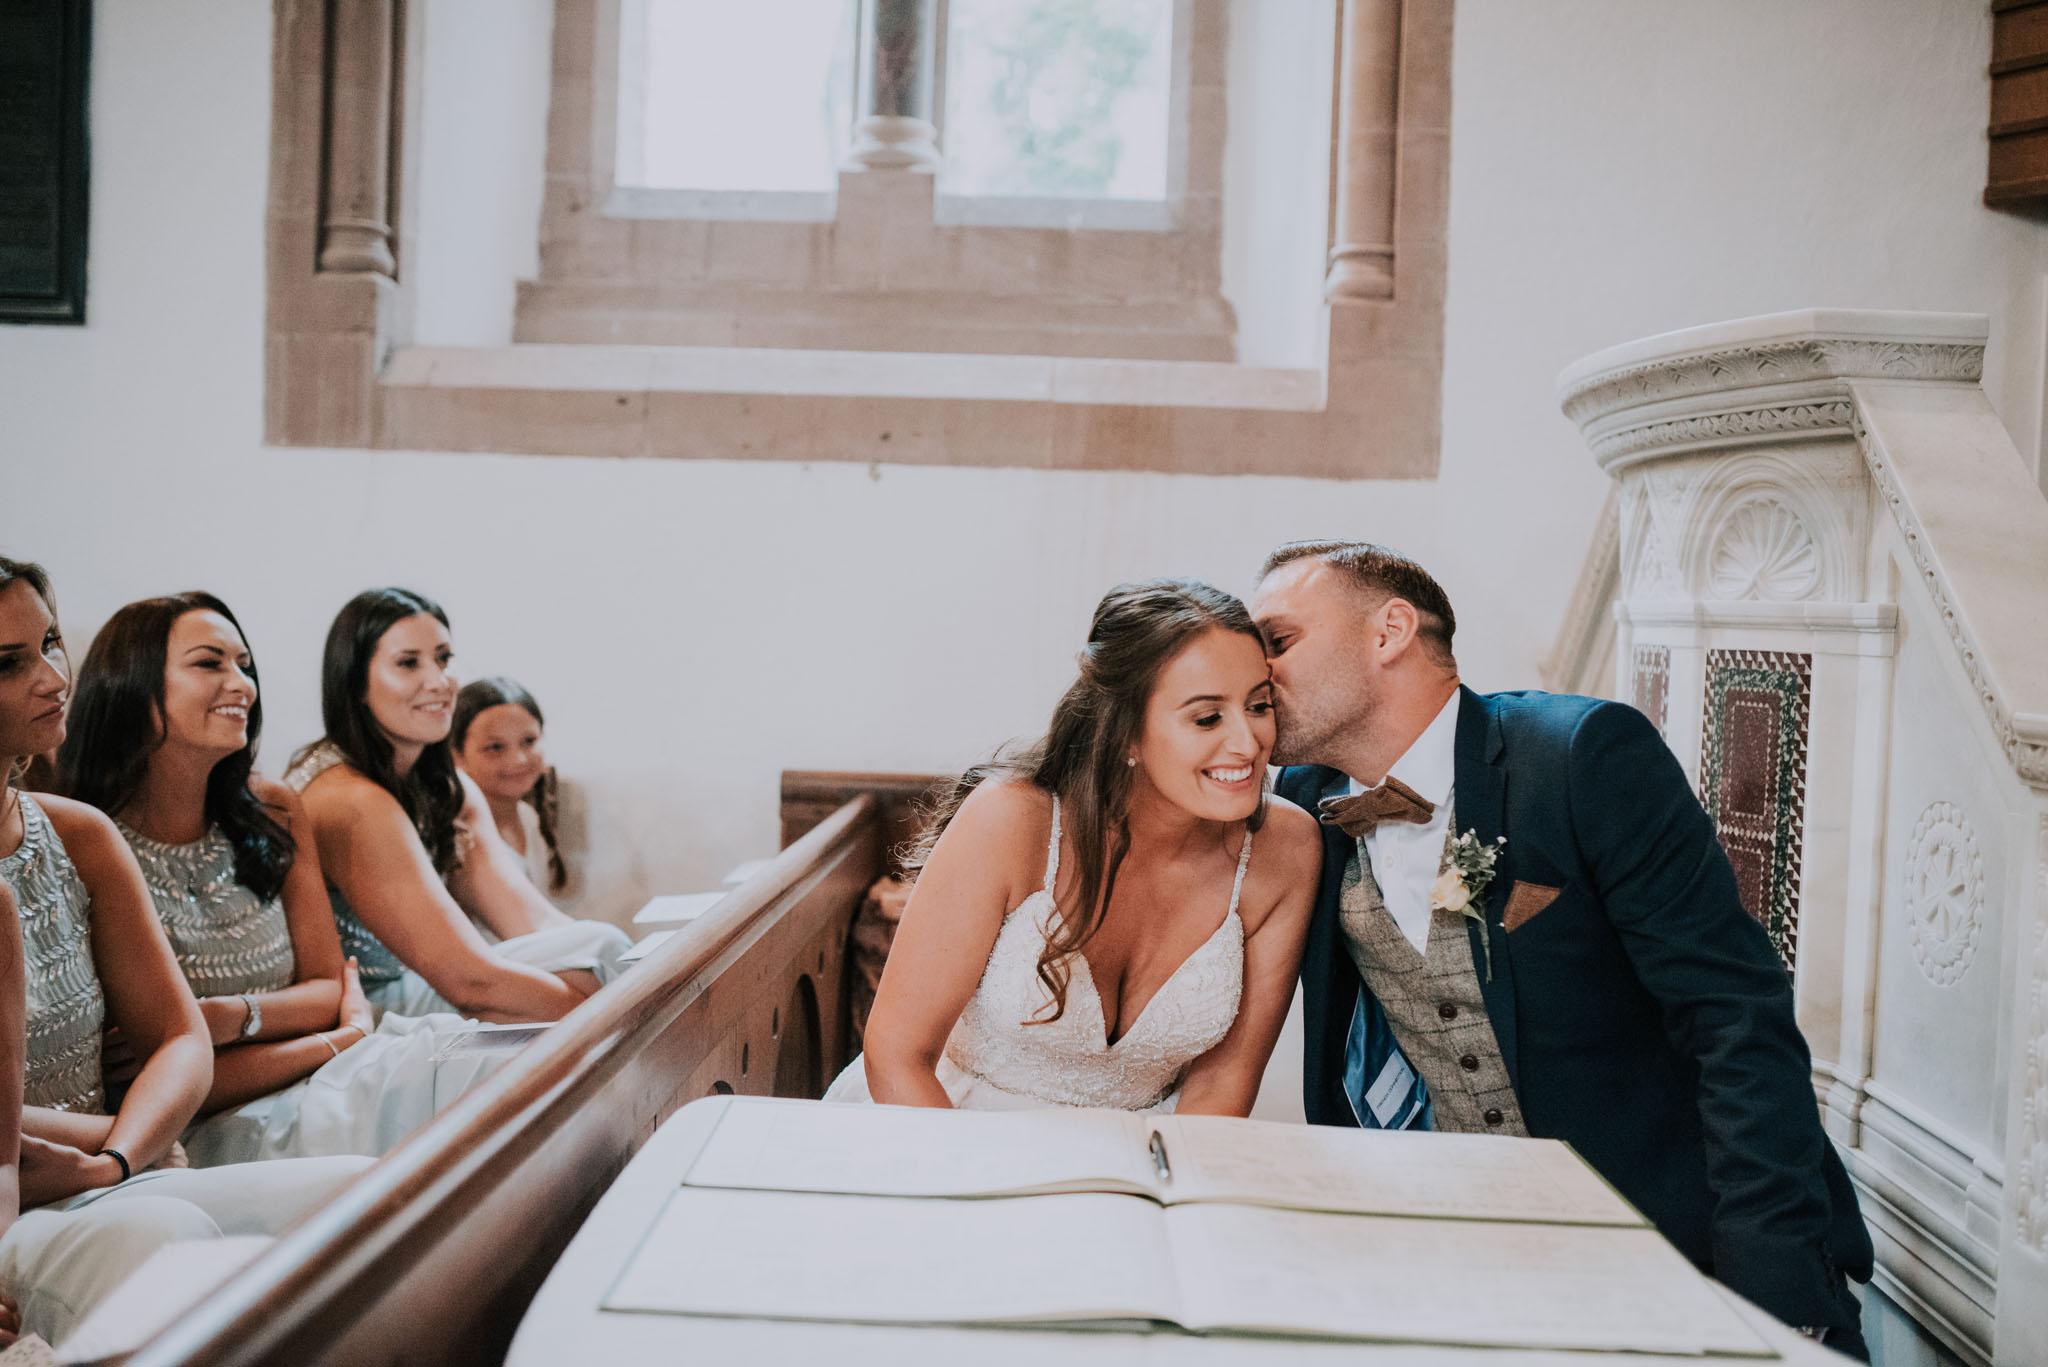 wedding-photographer-glewstone-court-hereford-scott-stockwell-photography200.jpg